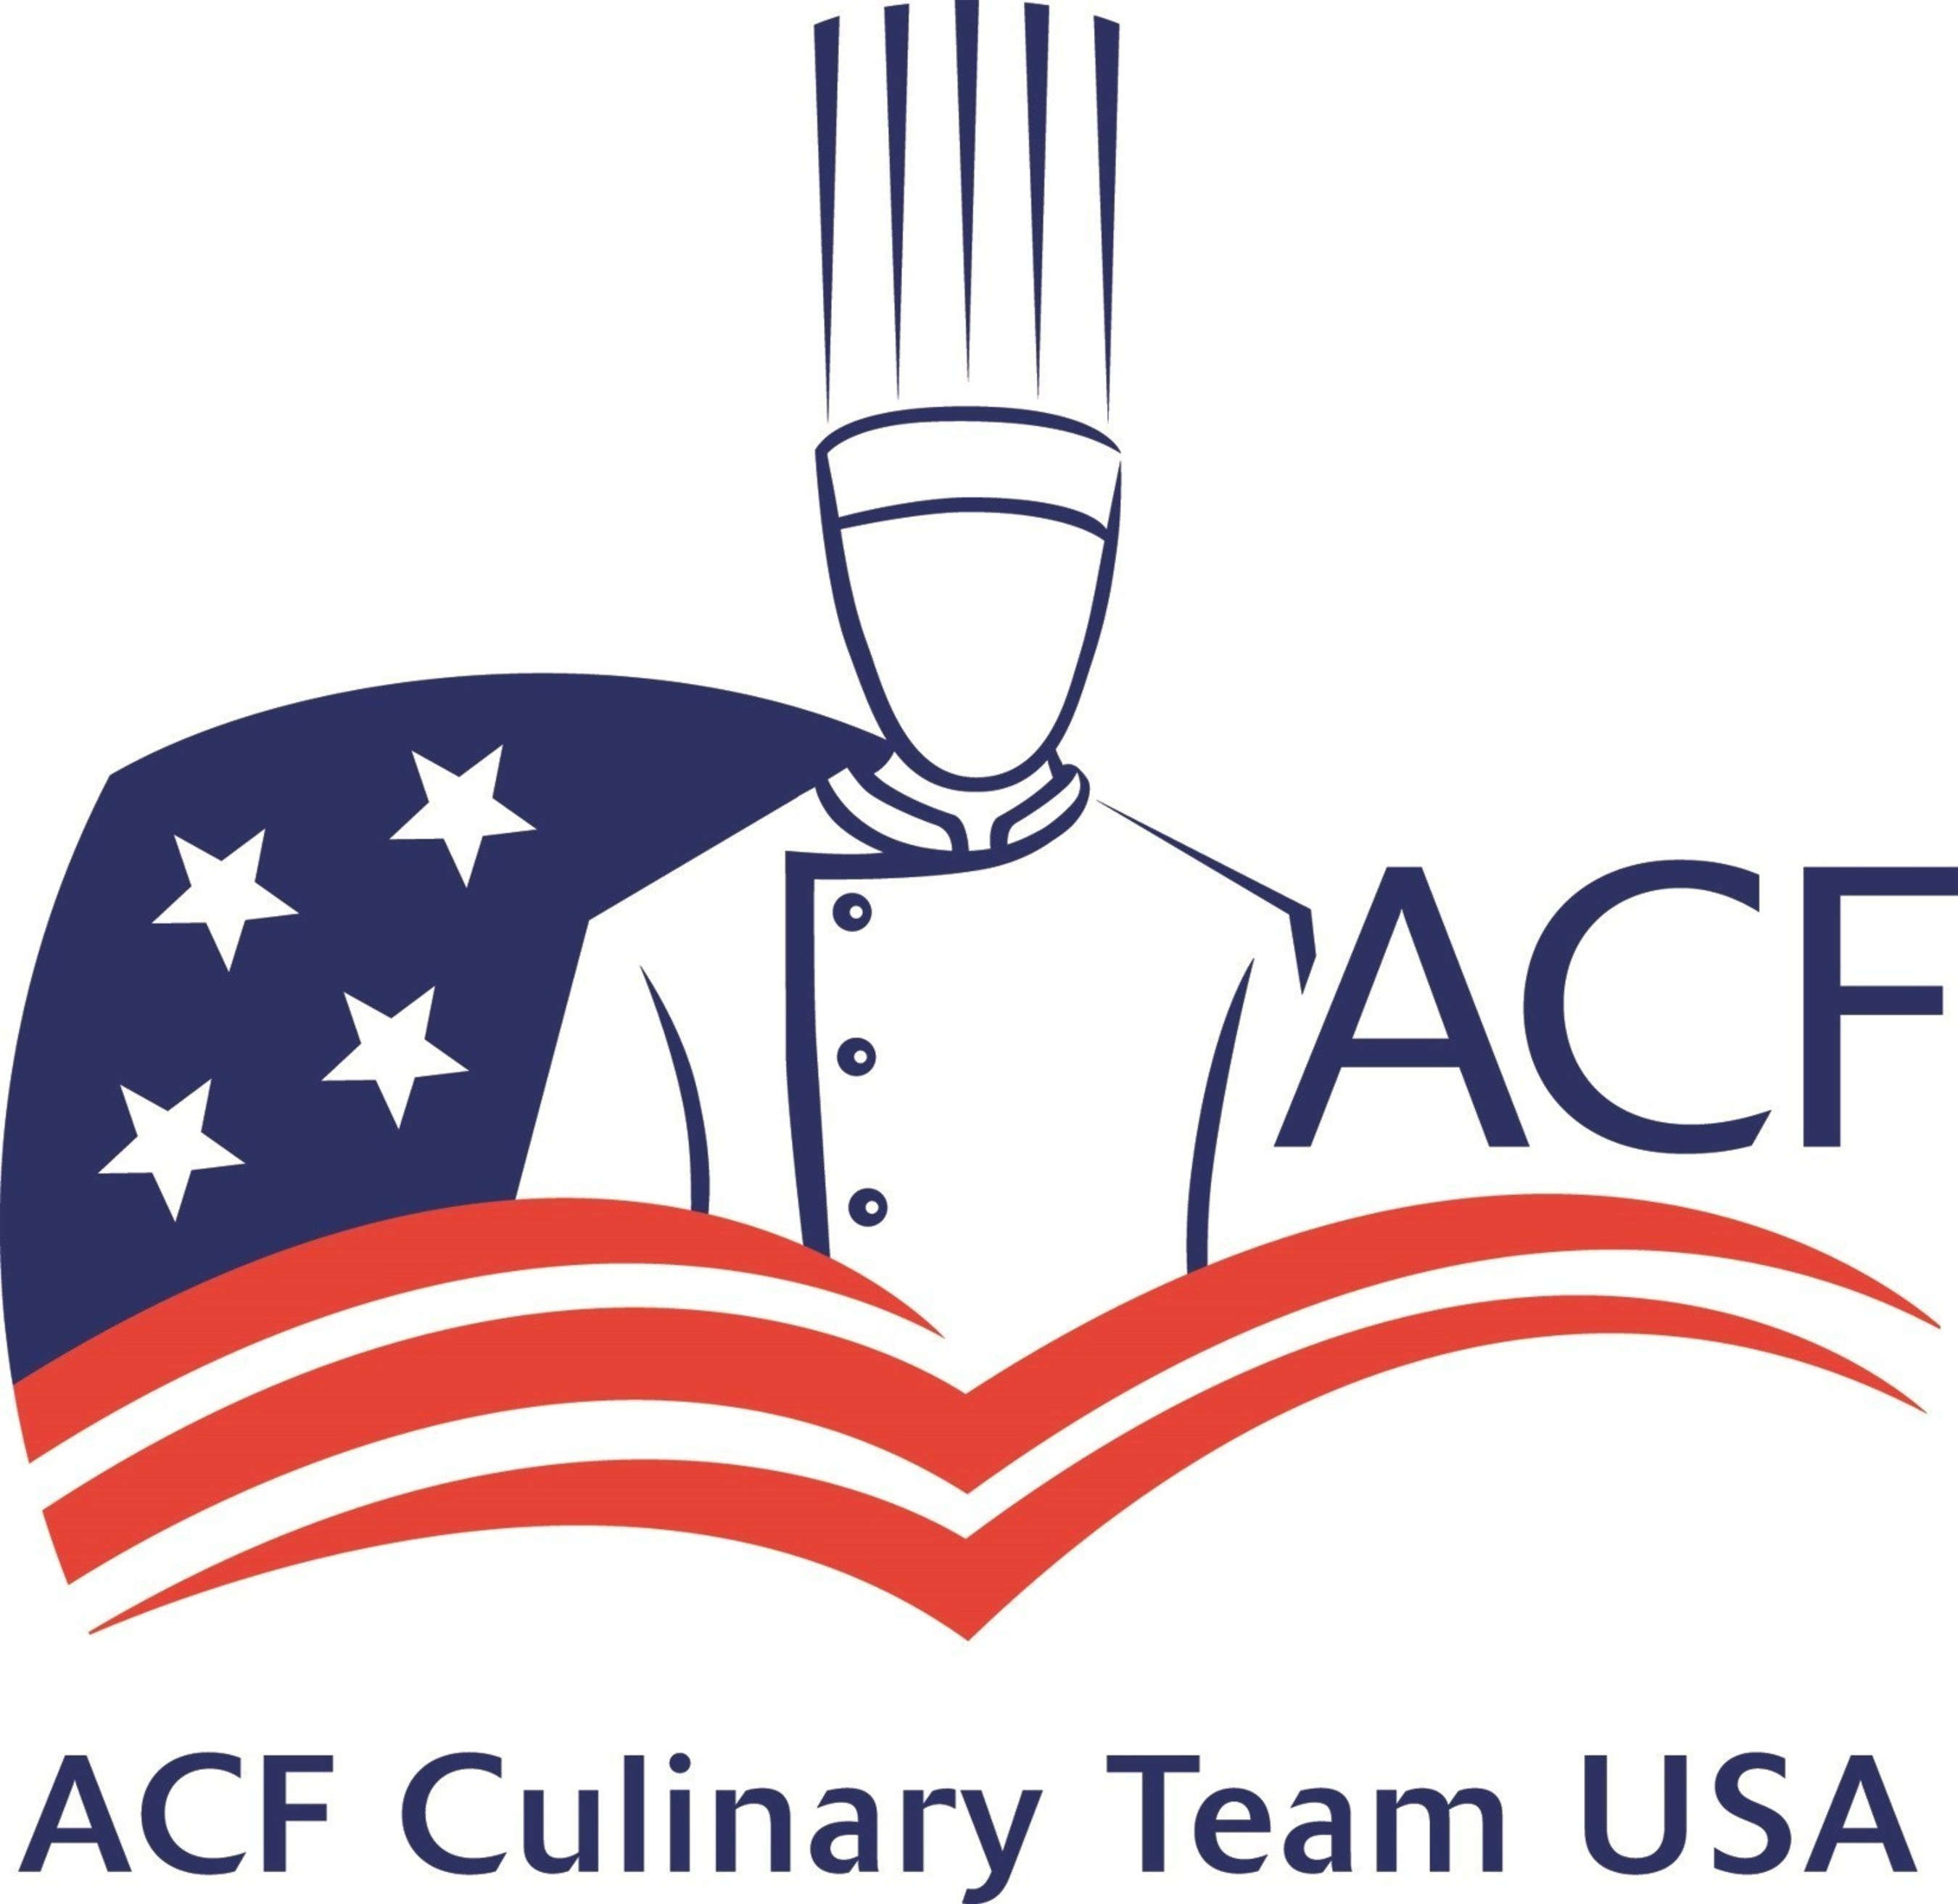 ACF Logo PNG Transparent & SVG Vector - Freebie Supply